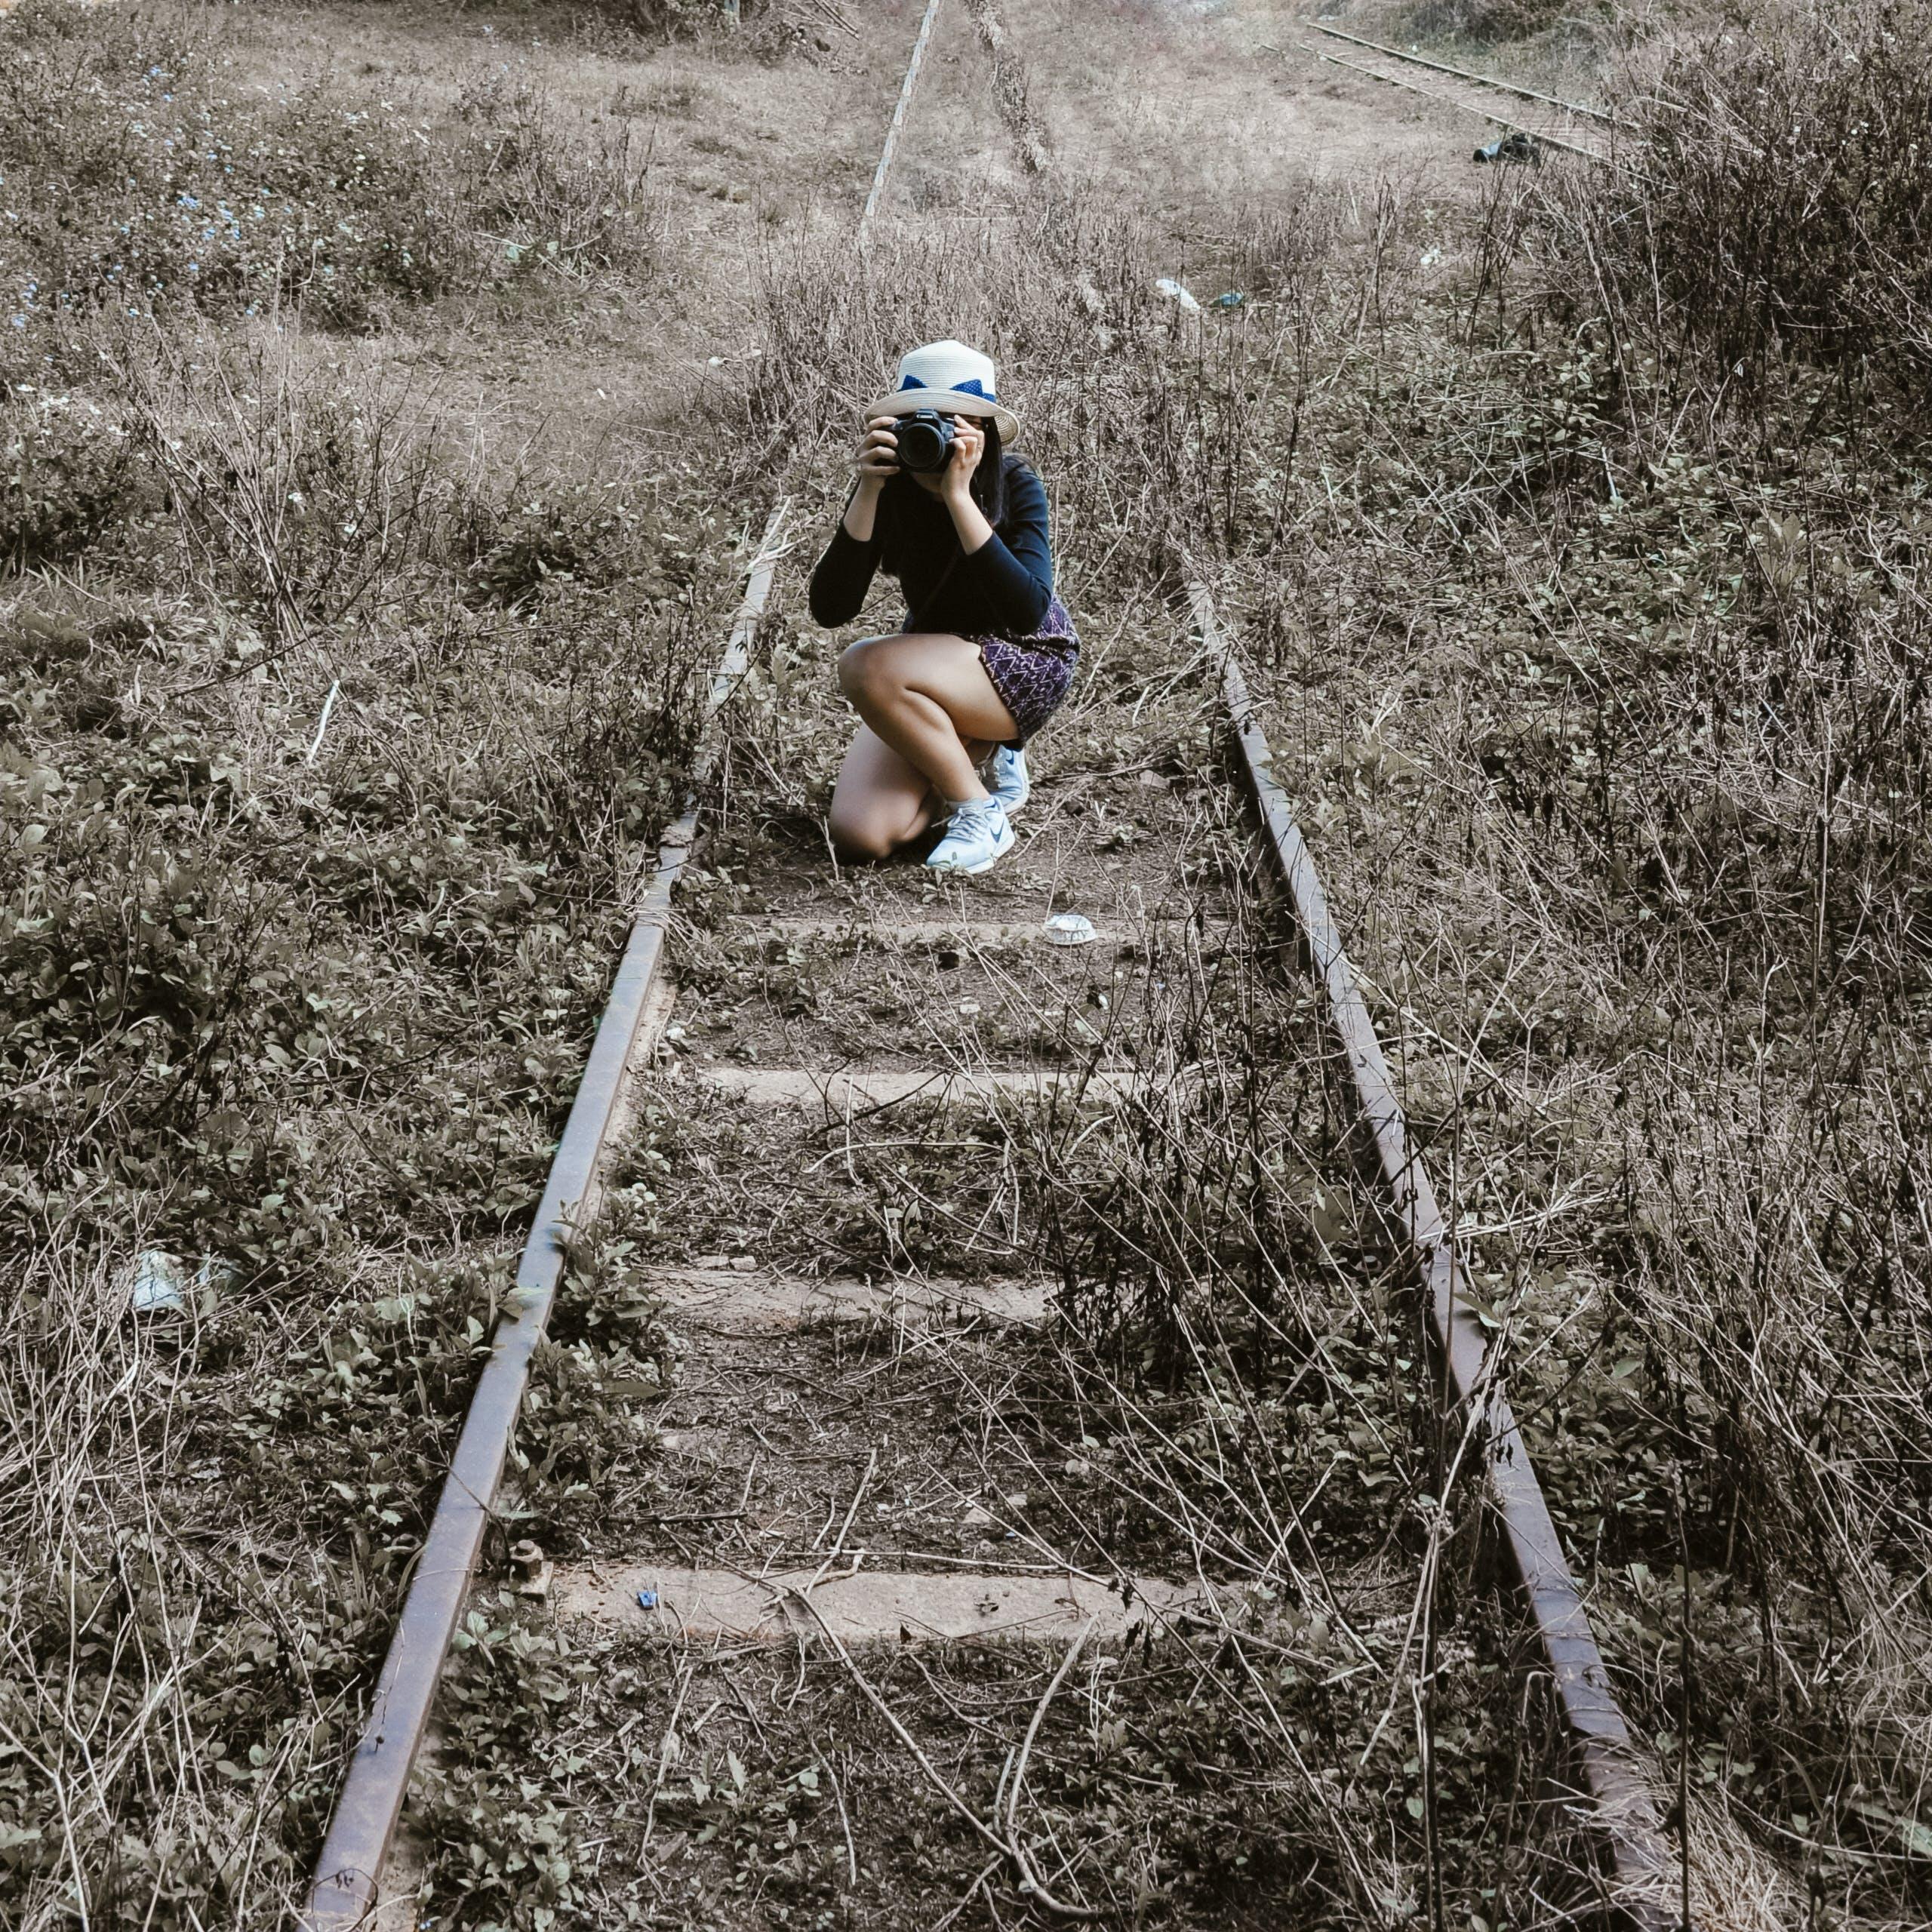 Woman White Round Hat Holding Black Dslr Camera on Rail Way